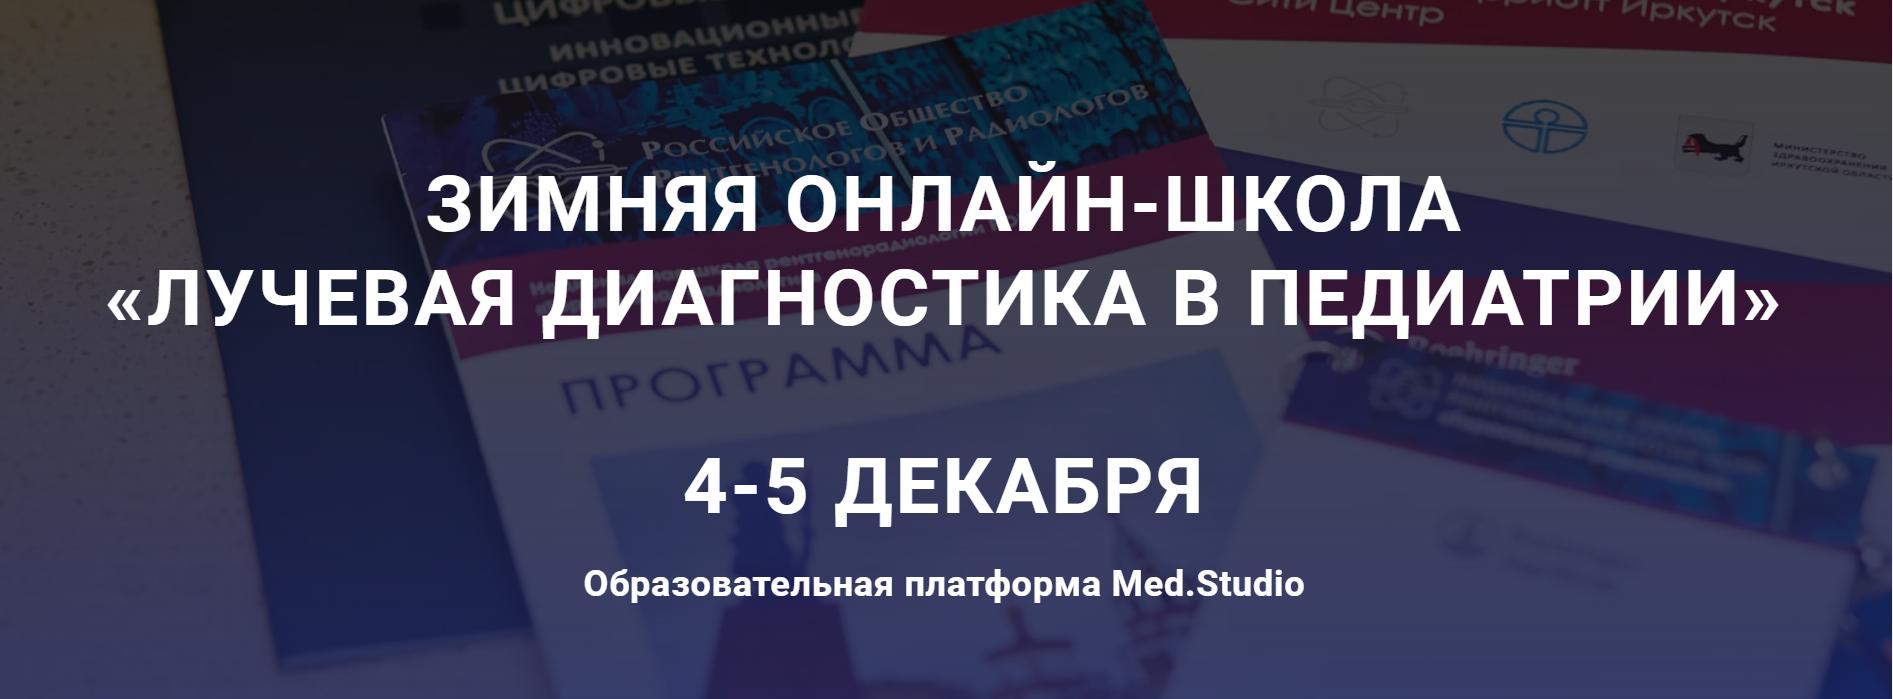 Зимняя онлайн-школа «Лучевая диагностика в педиатрии»